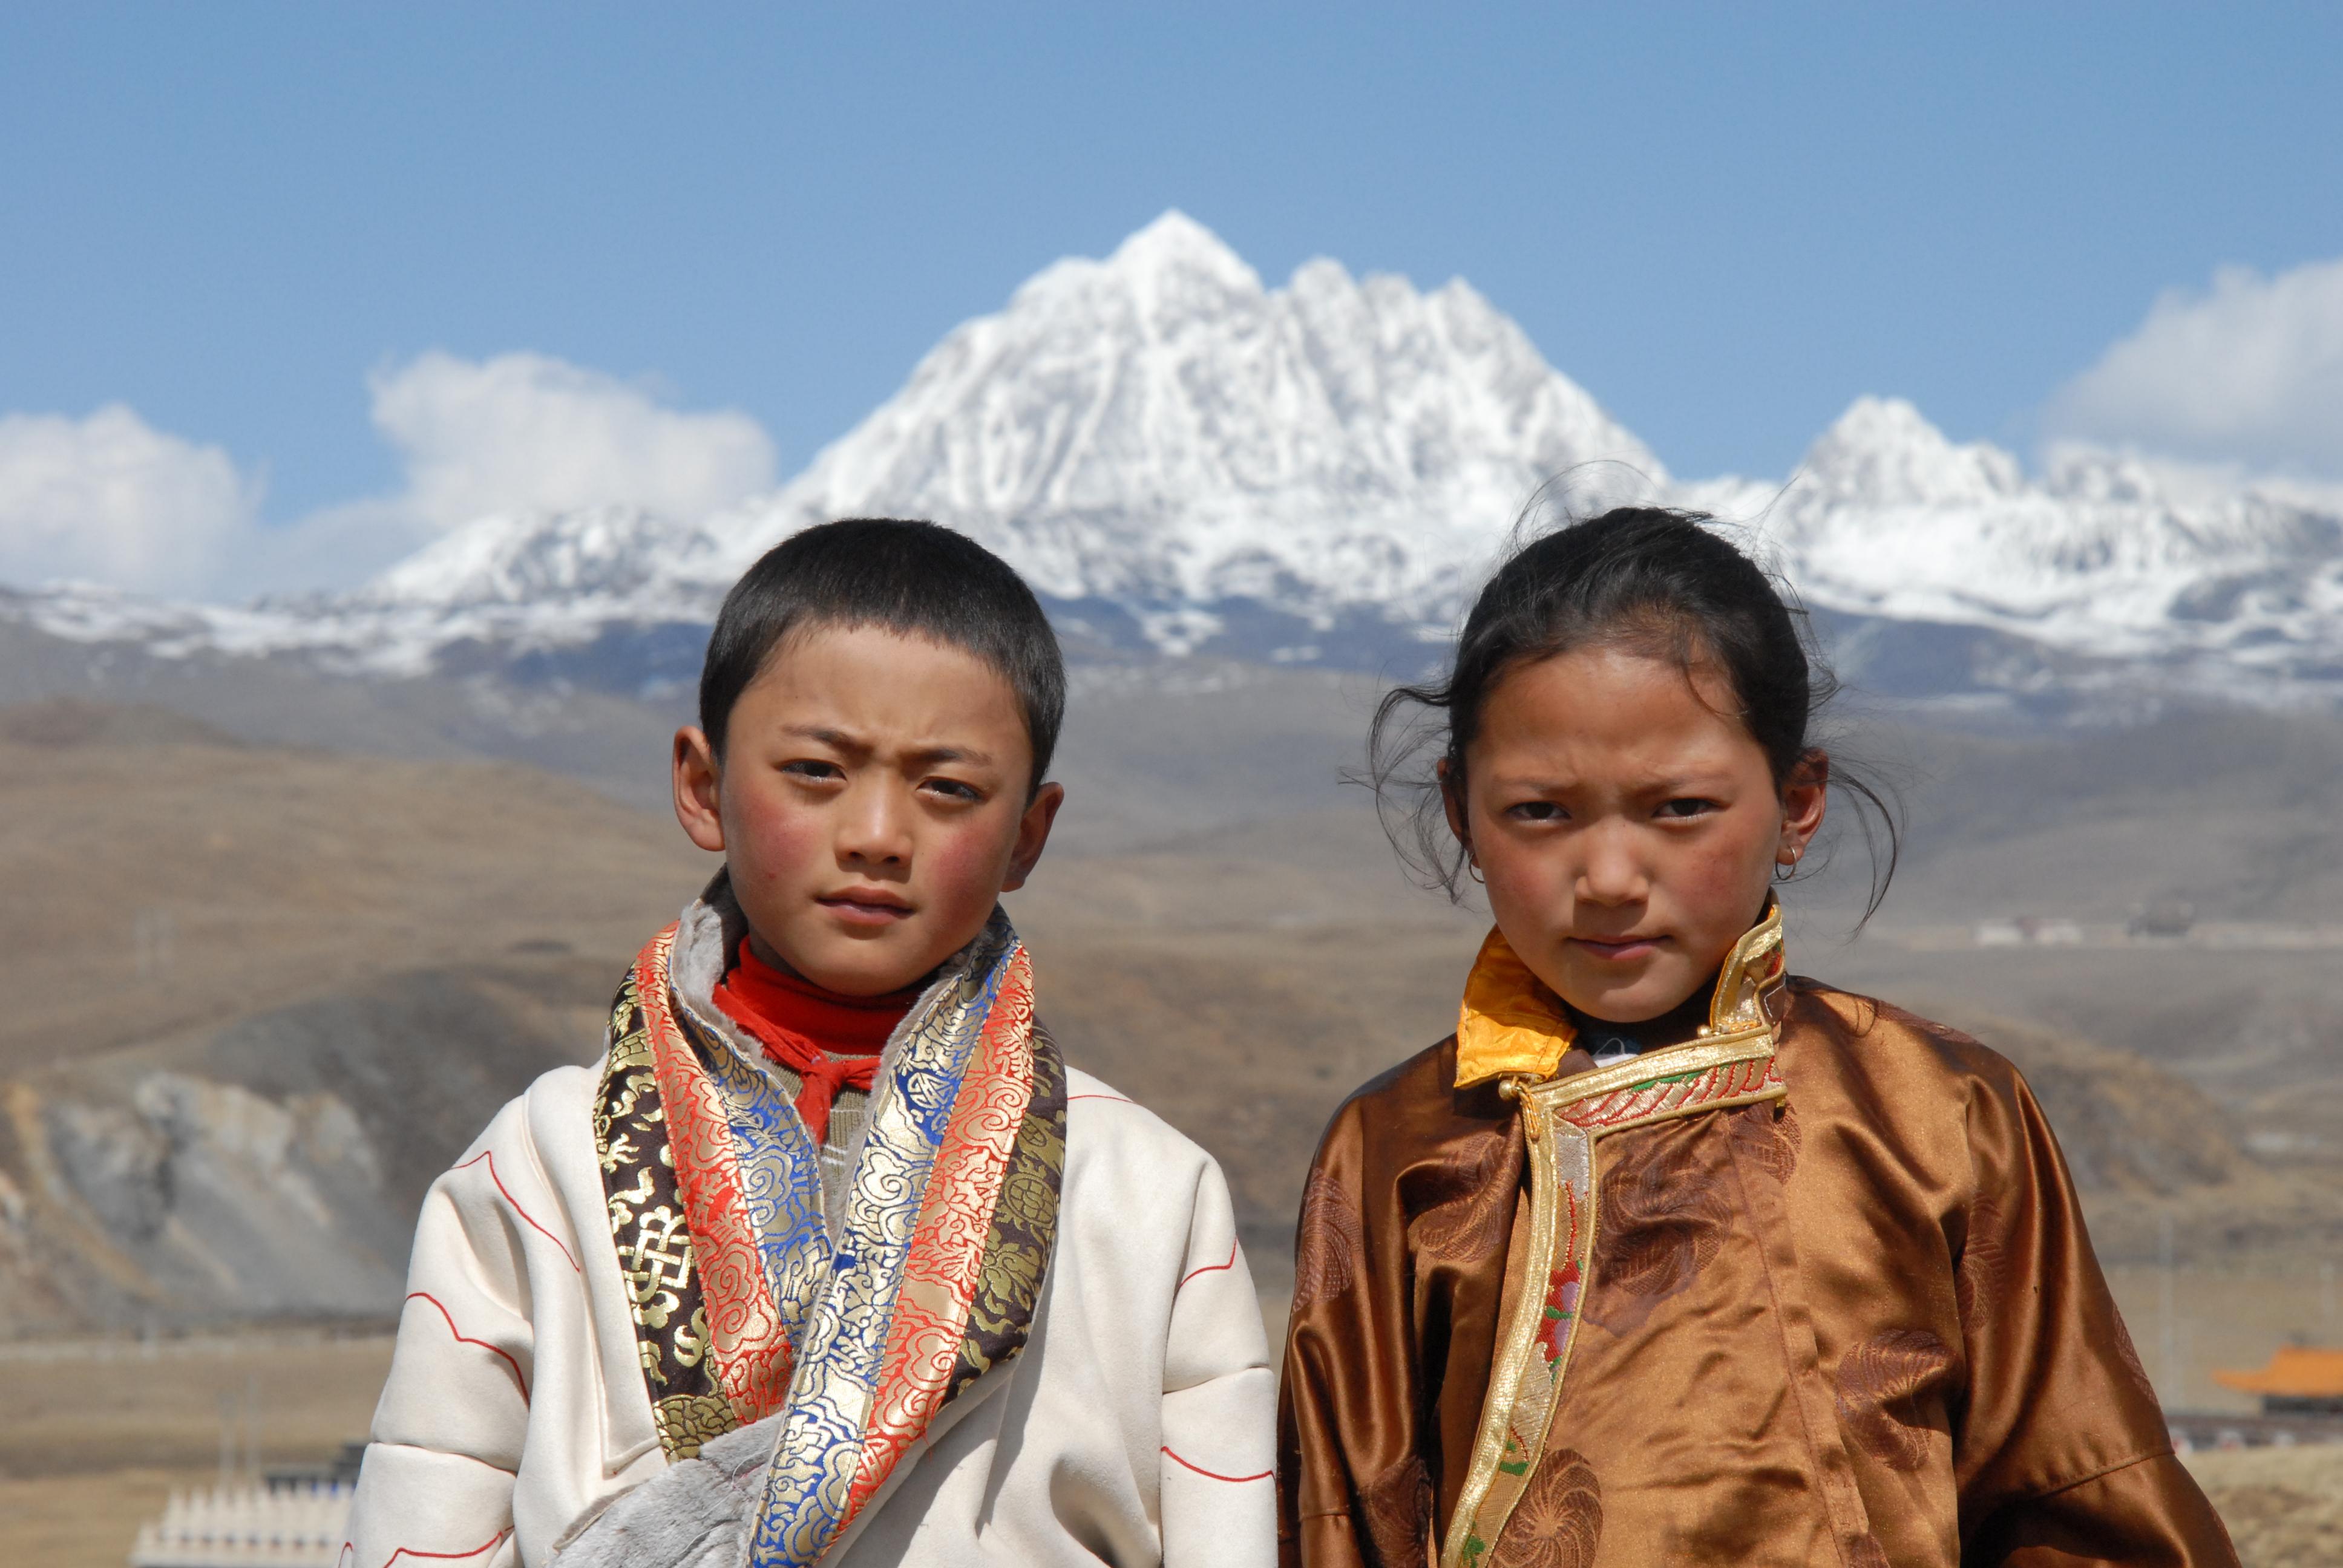 HD Quality Wallpaper | Collection: Artistic, 3872x2592 Tibetan